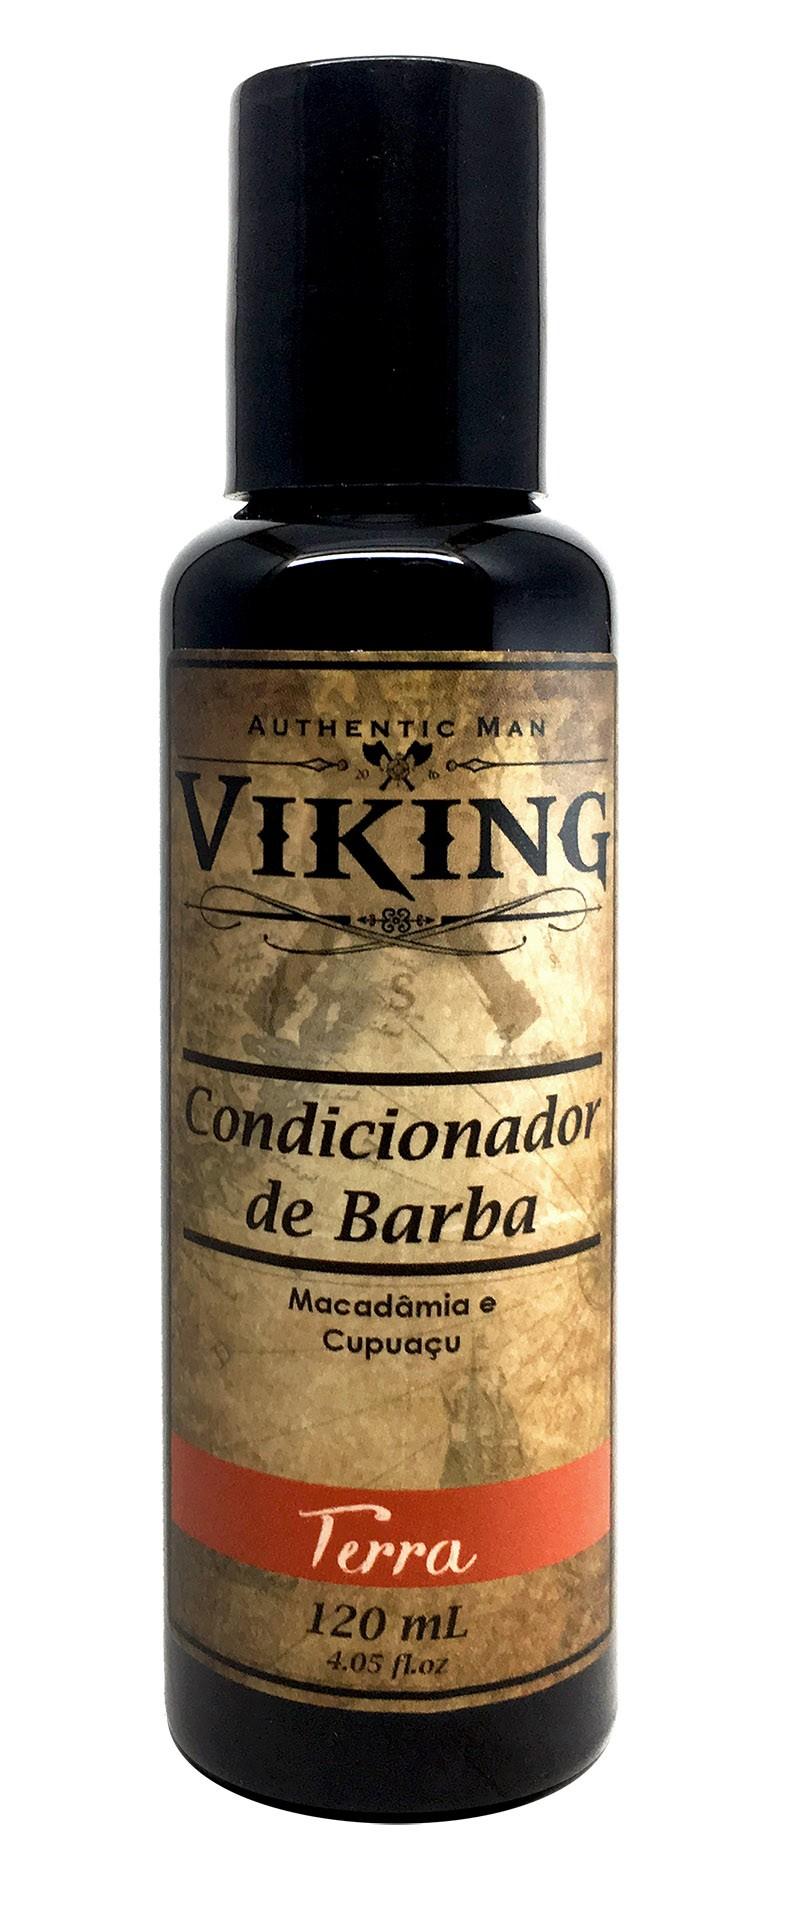 Condicionador de Barba - Terra - Viking 120 mL  - Viking